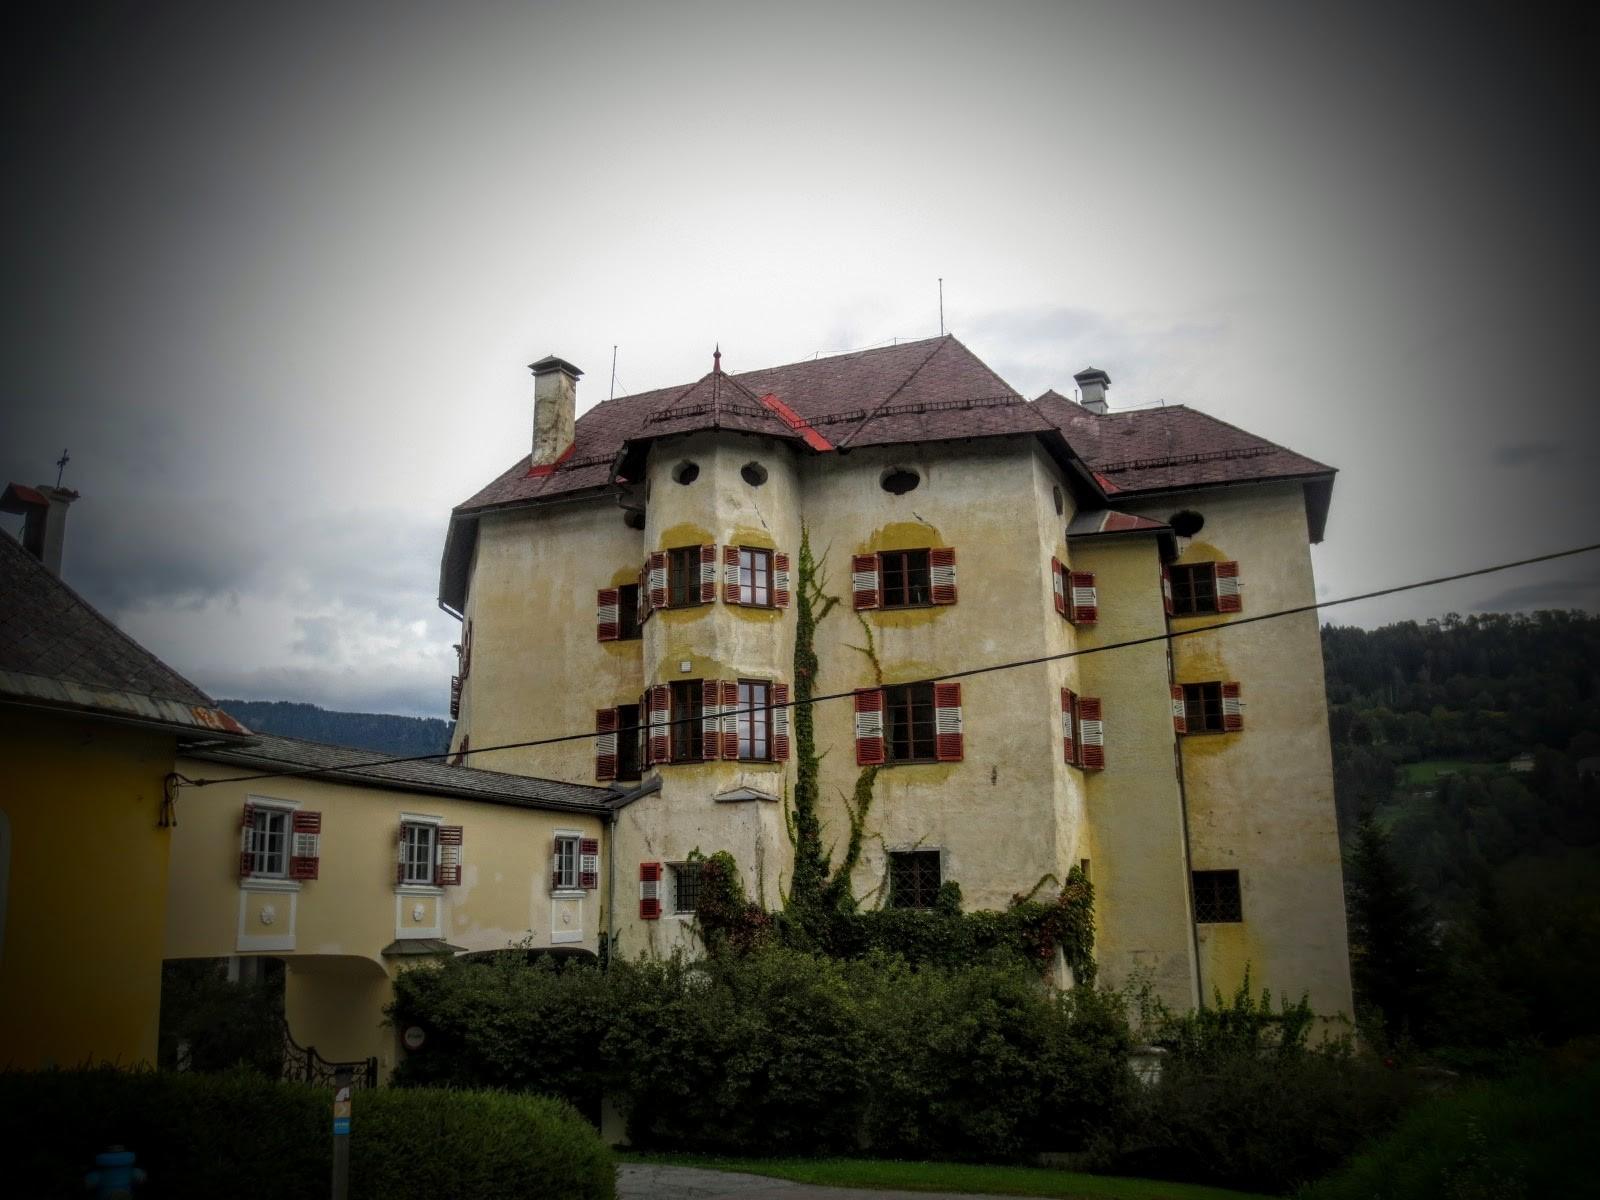 Schloss Biberstein in Himmelberg bei Feldkirchen